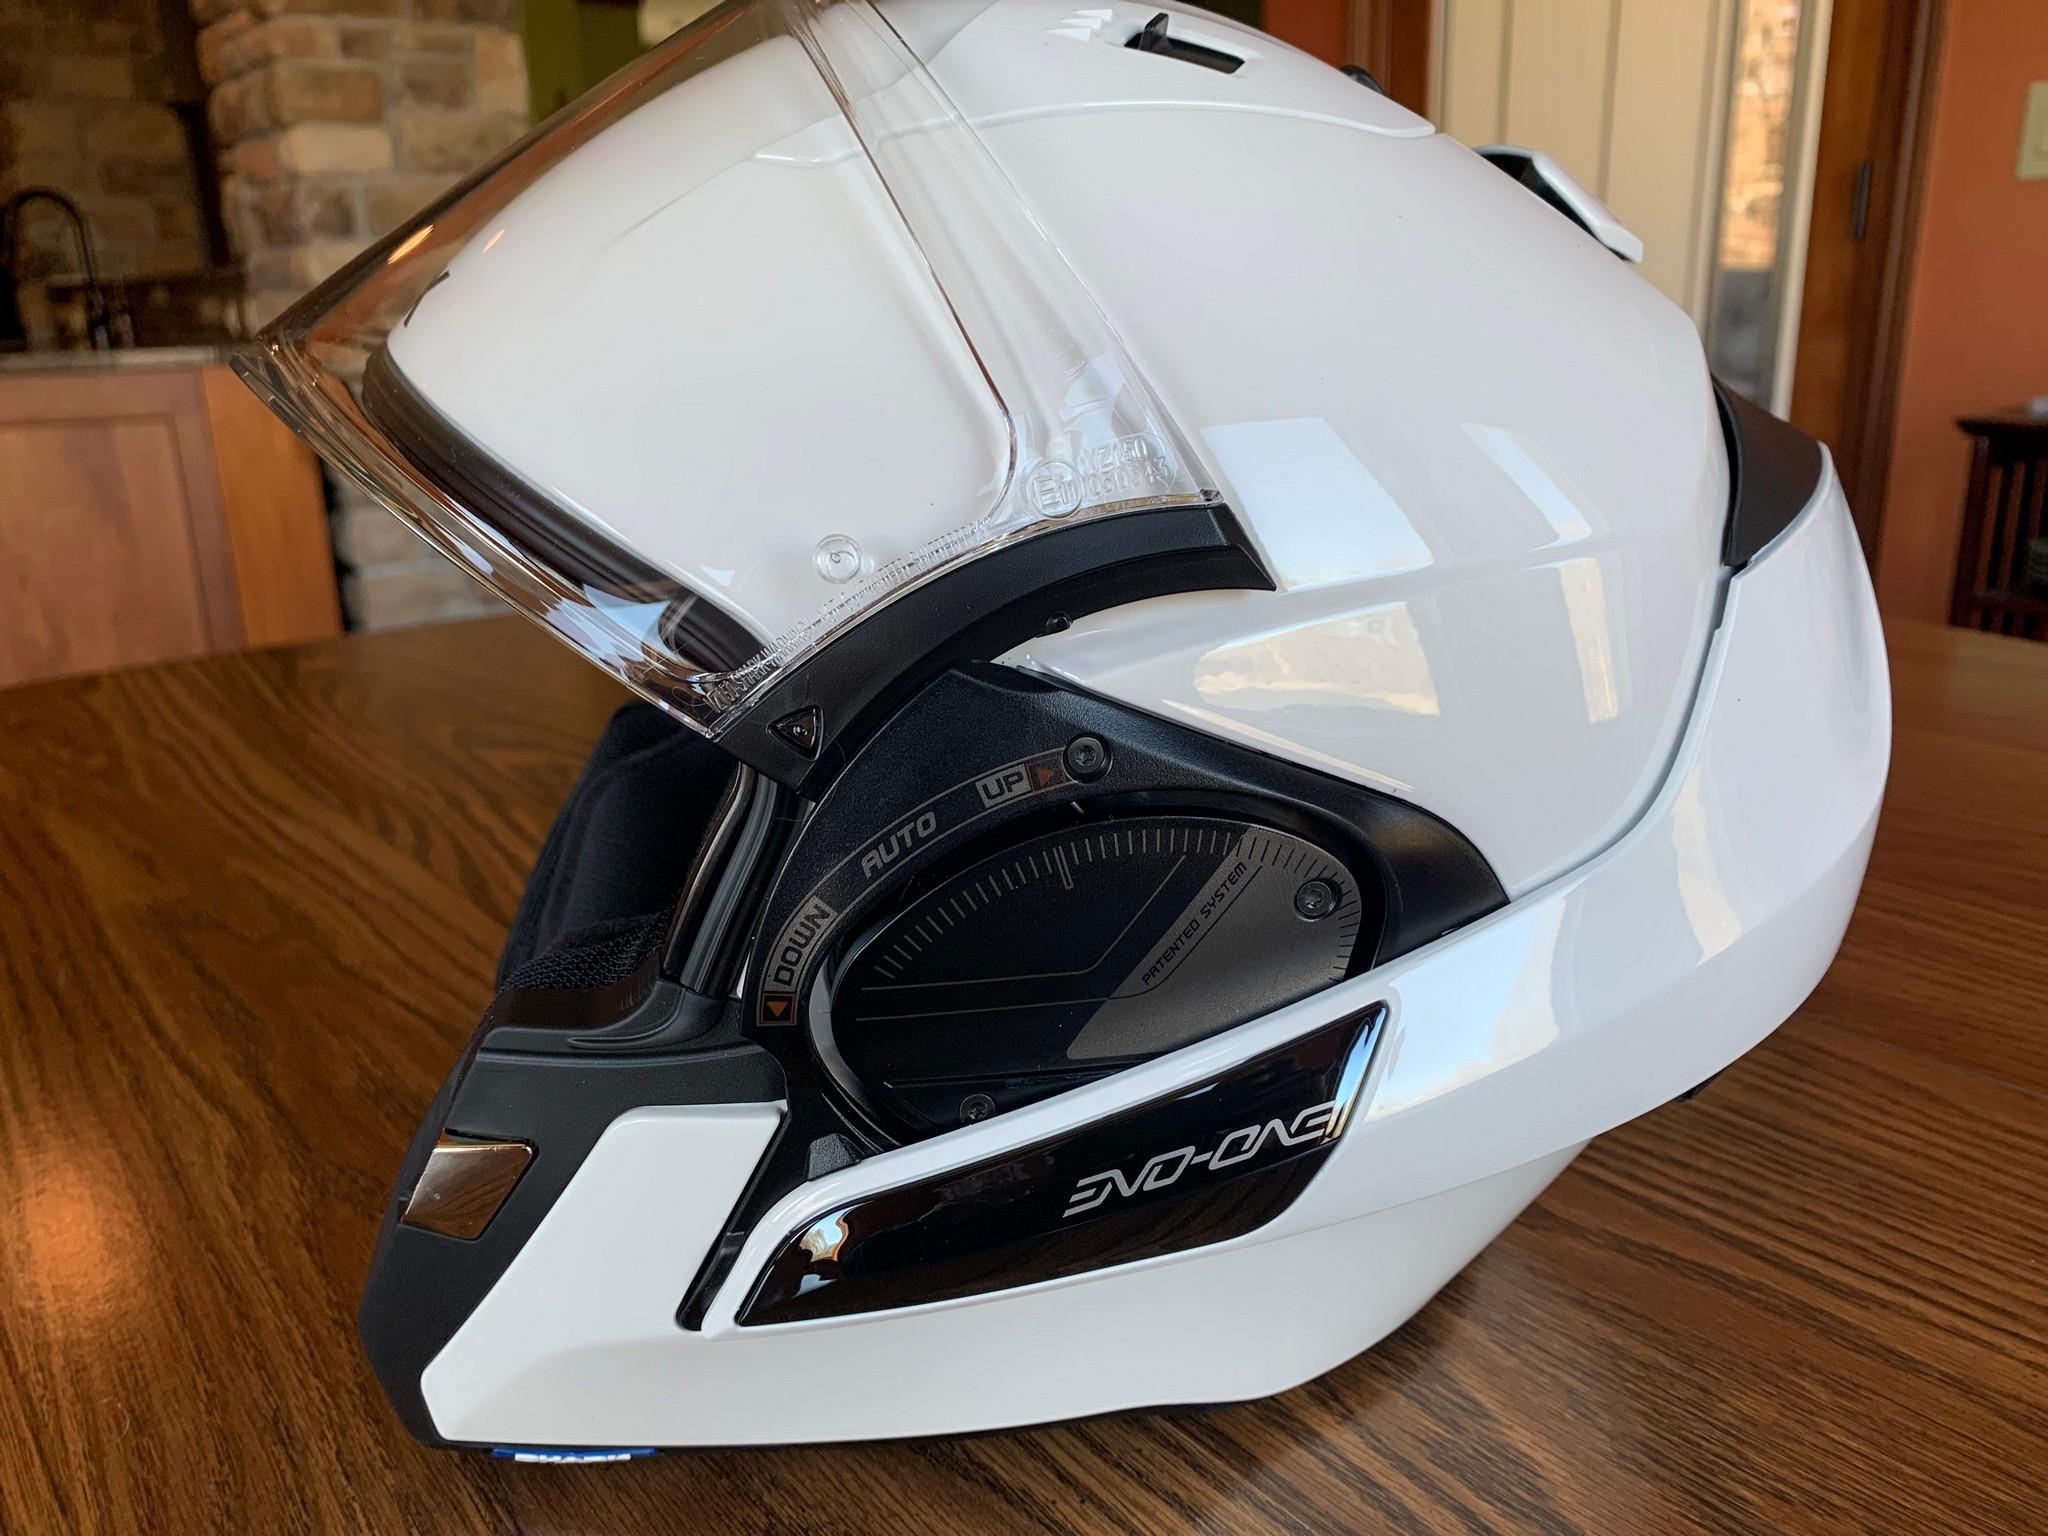 Side view of Shark EVO One 2 helmet